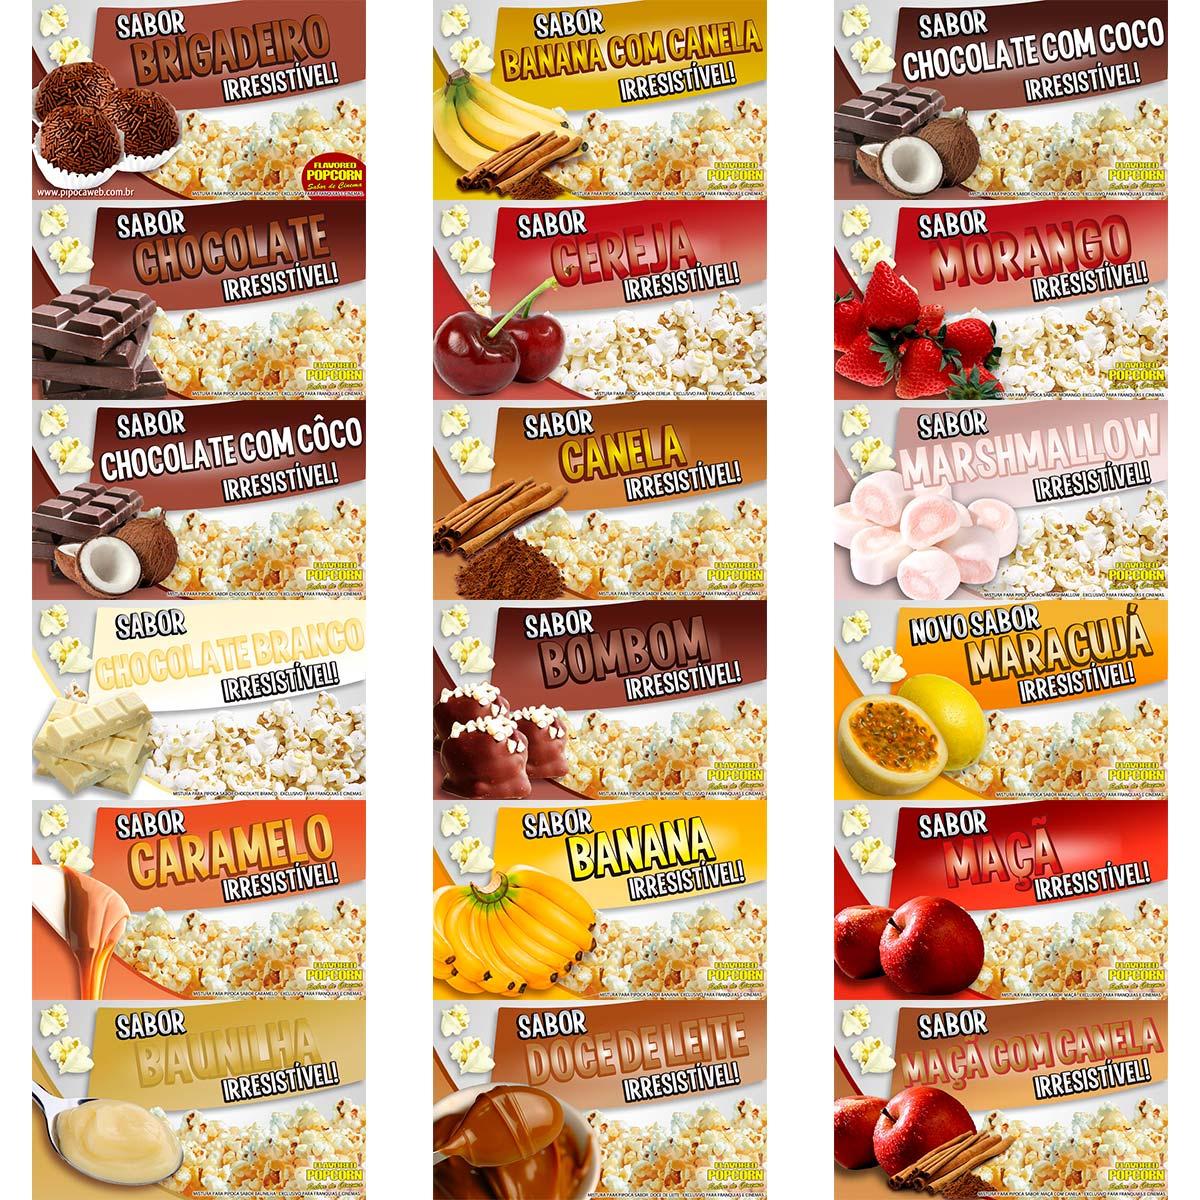 Caramelos p/ Pipoca Doce - 18 sabores - Escolha - 10kg - Atacado